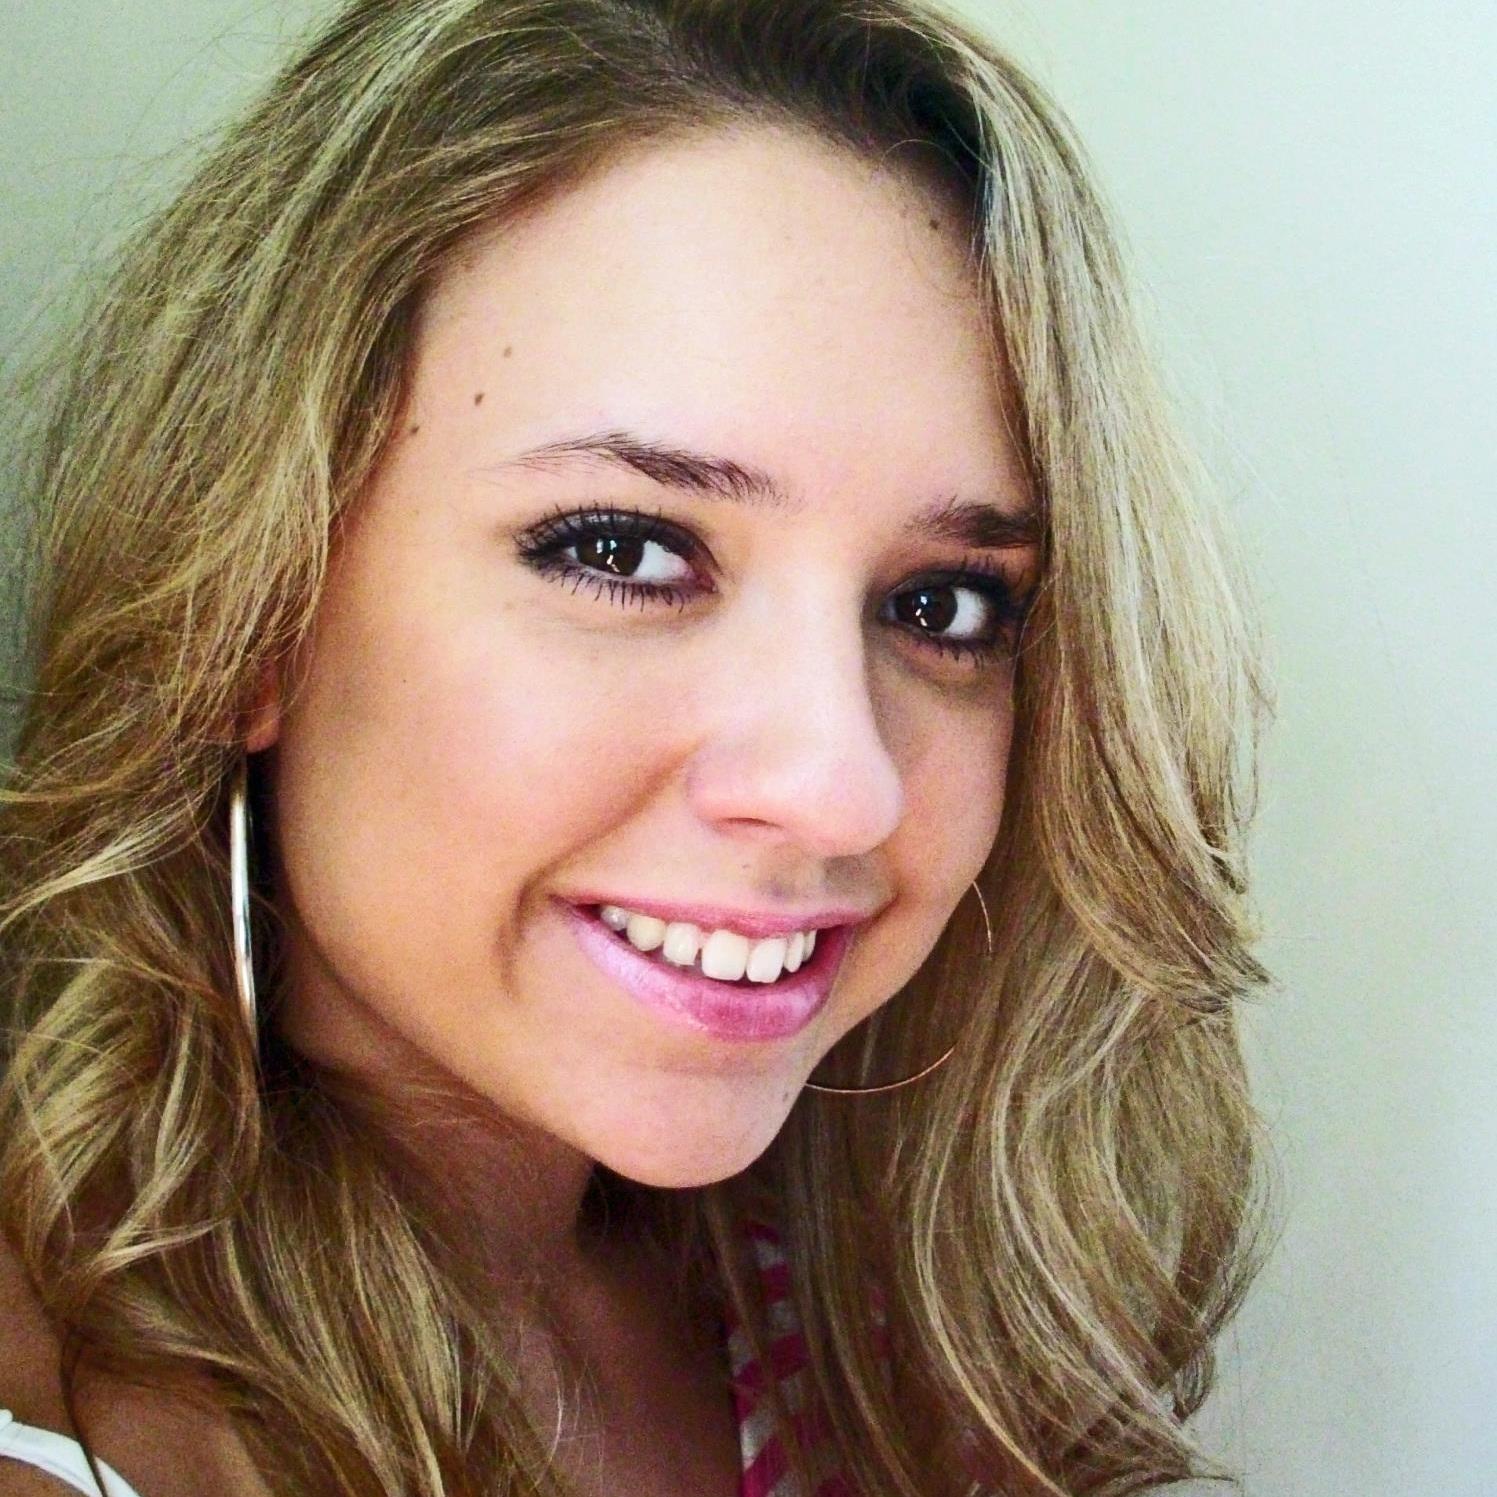 Cheyenne Lowe - Violin - cheyennelowe26@gmail.com